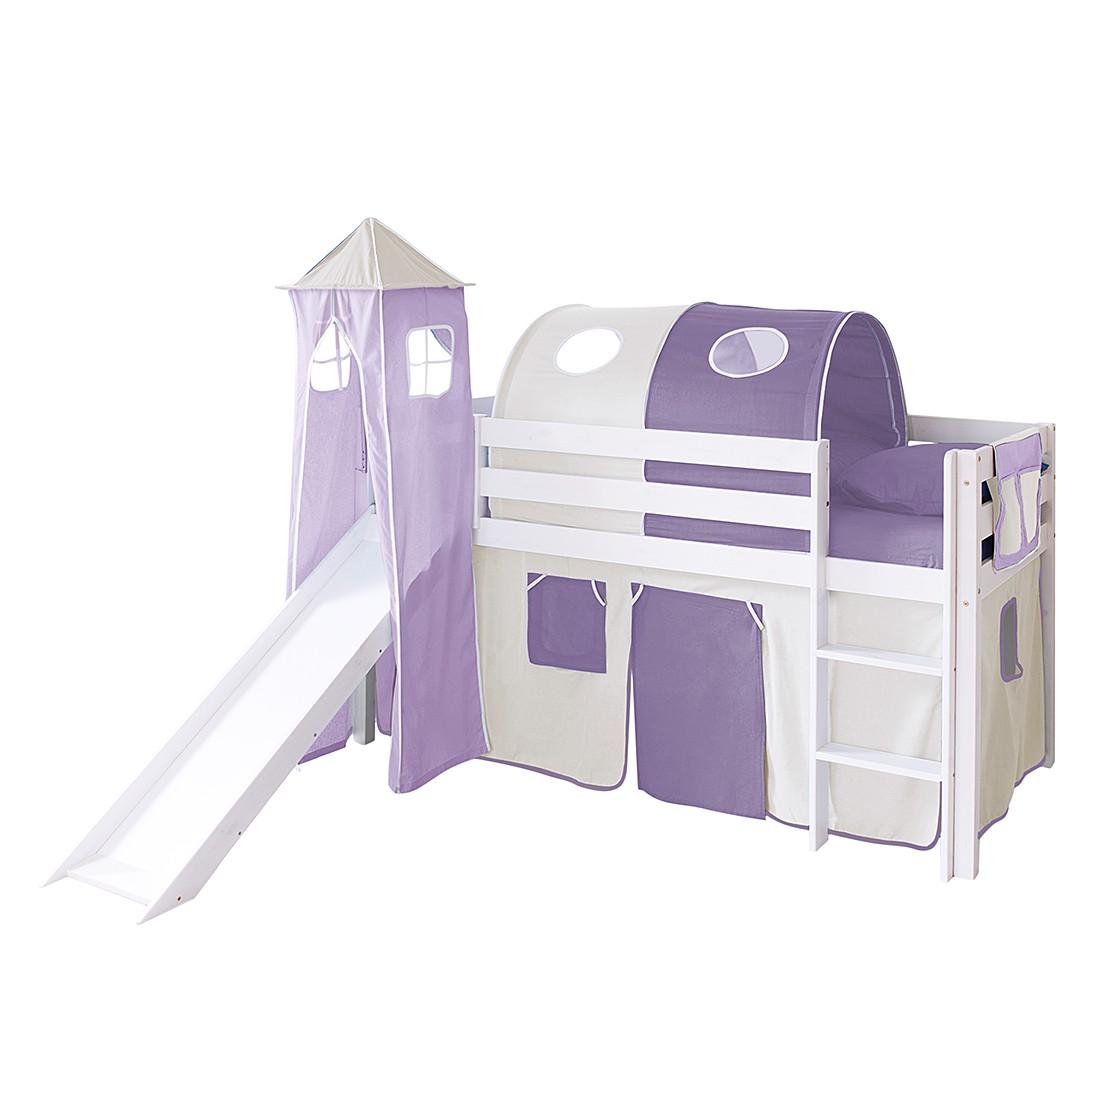 Home 24 - Lit ludique kasper ii - pin massif beige / violet modèle de base, ticaa